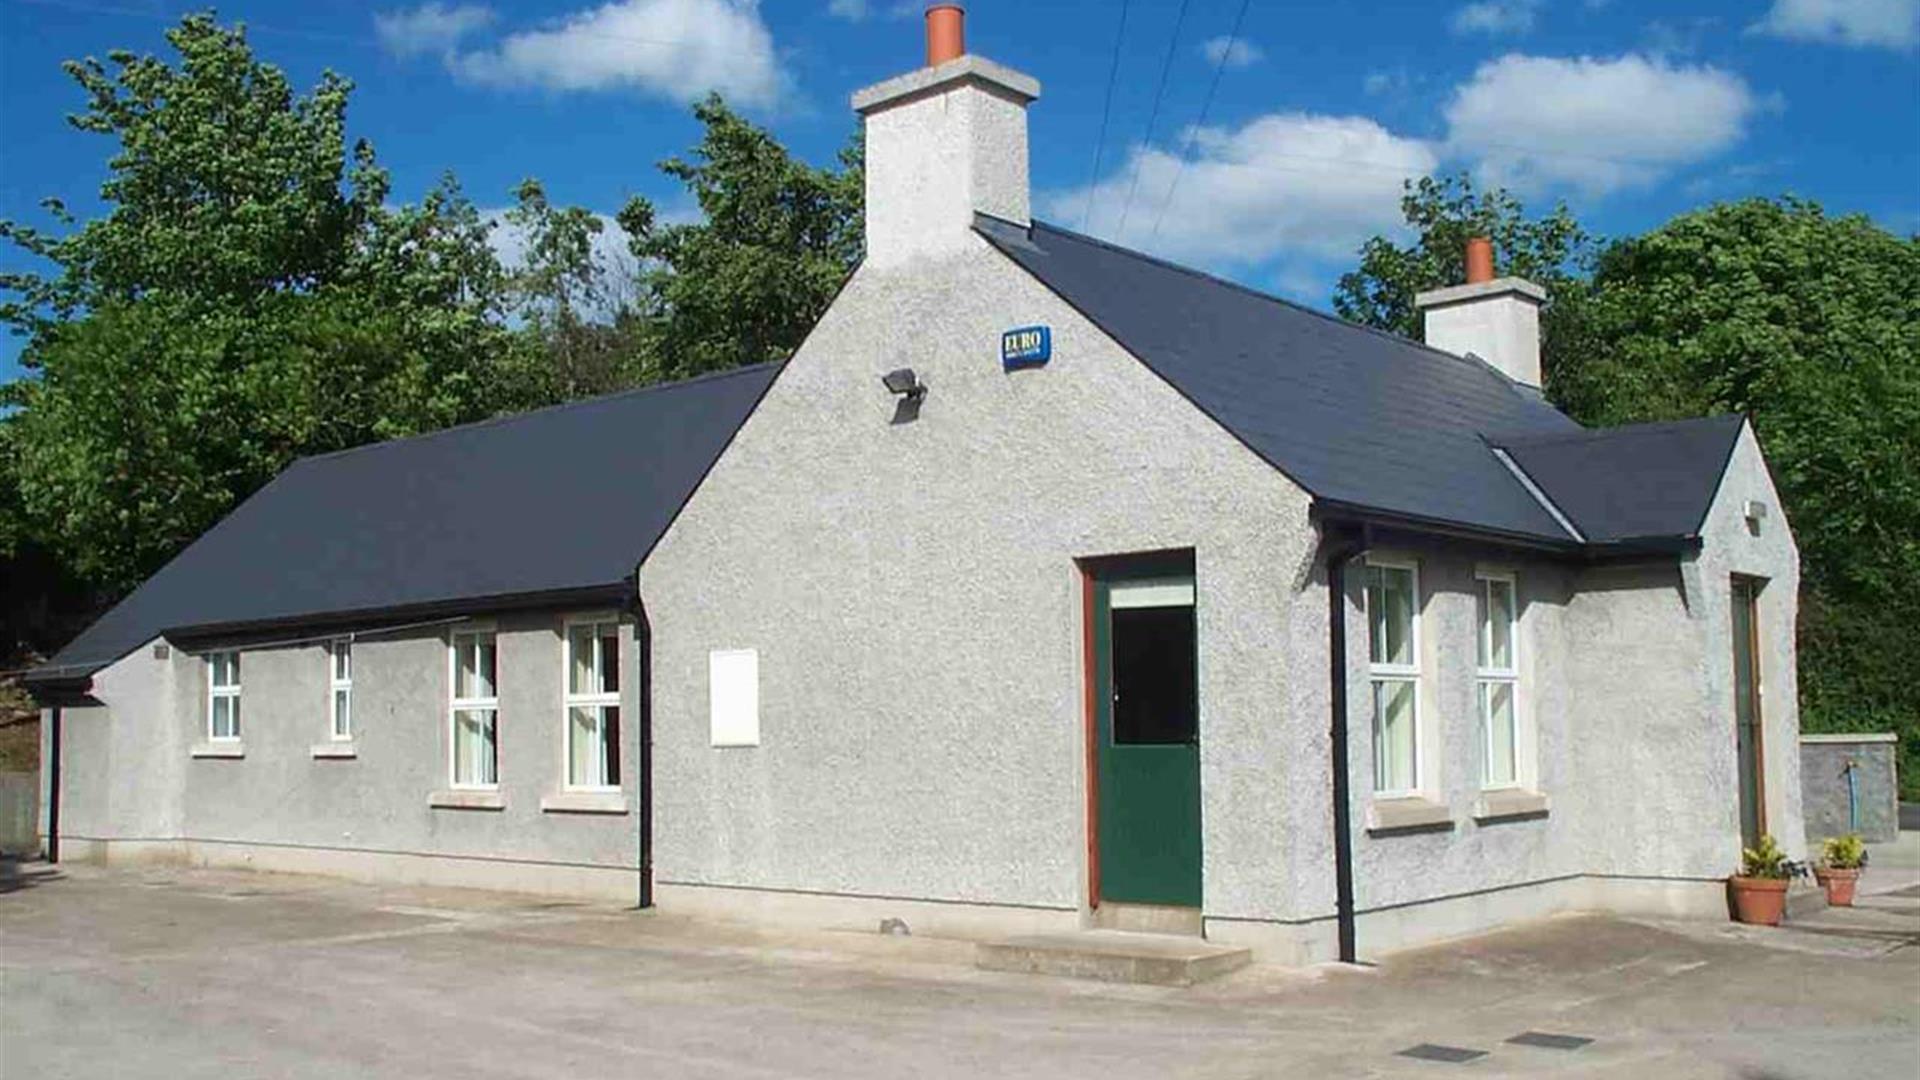 Derry Farm Cottages - Managhmore